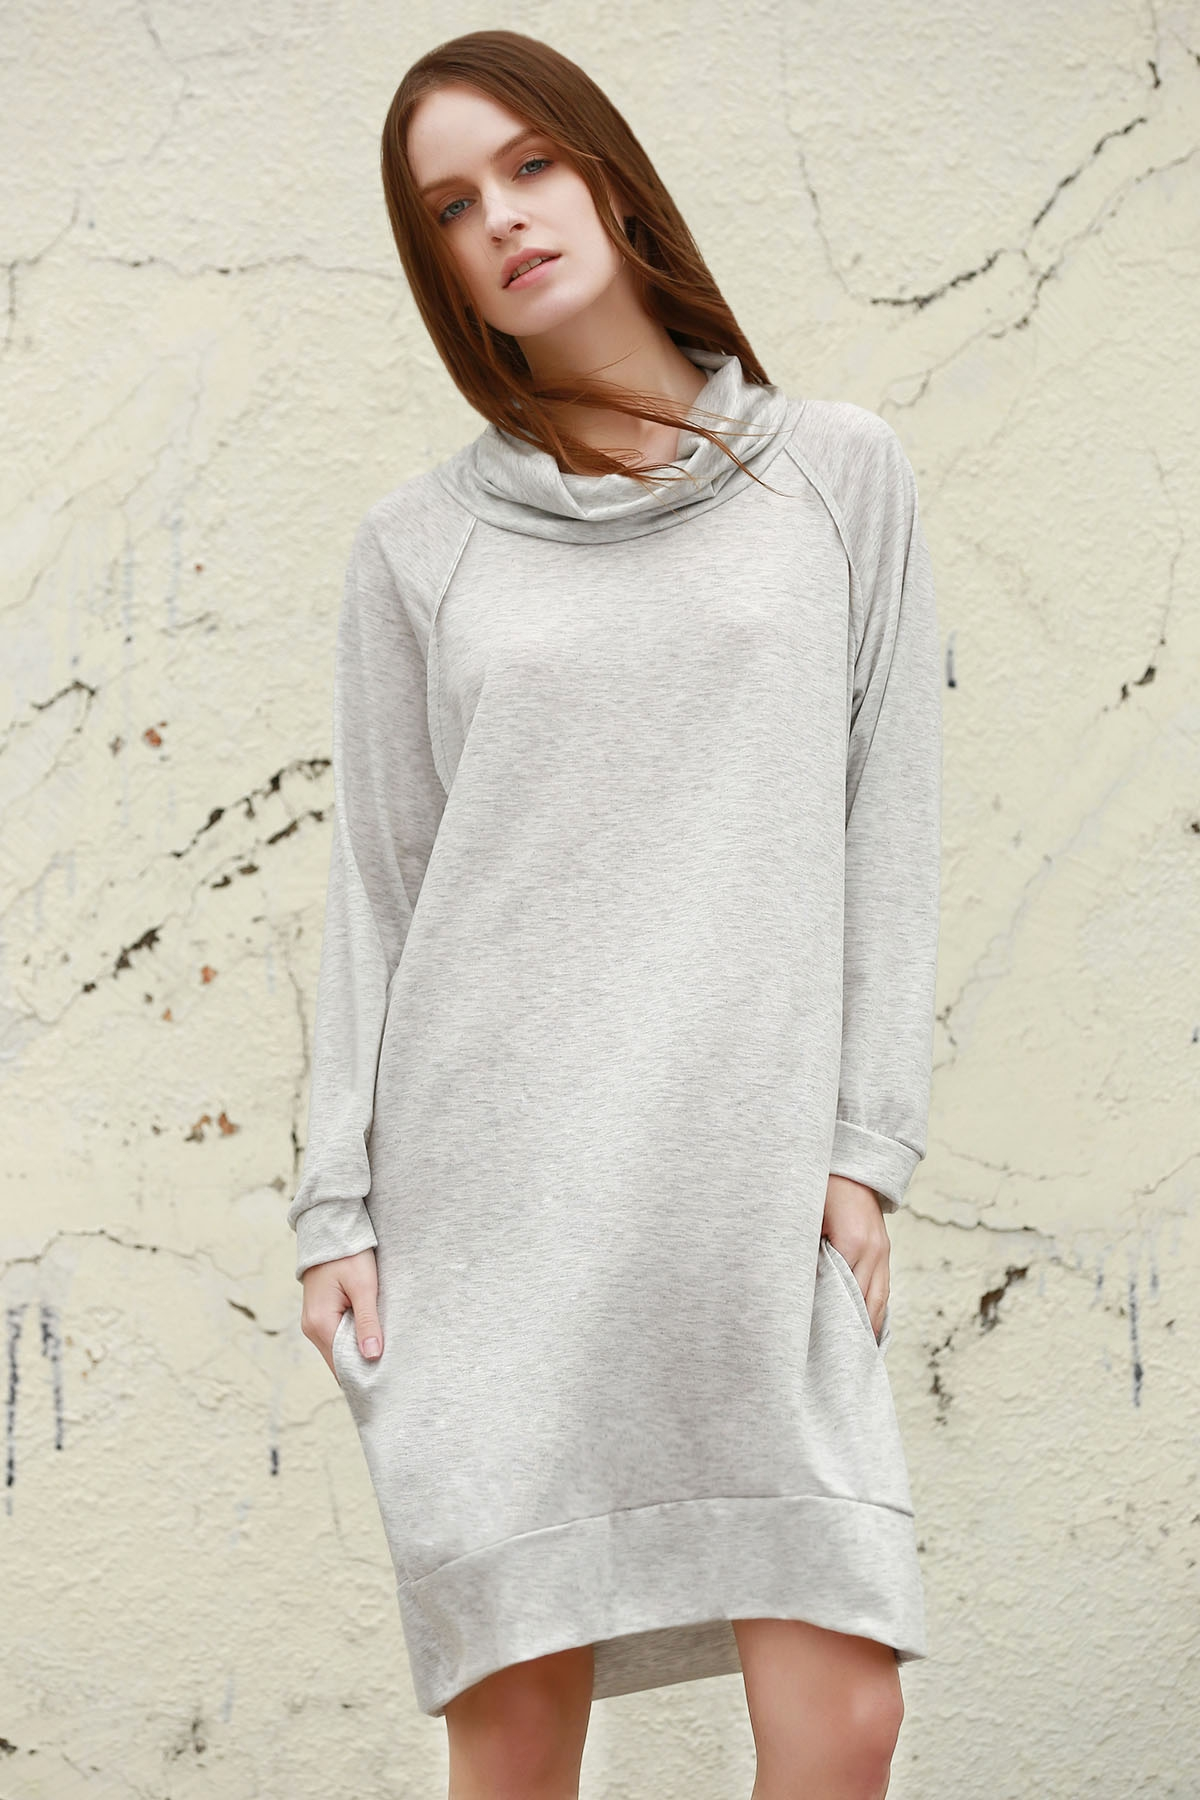 Heaps Collar Long Sleeve Loose Dress - GRAY S